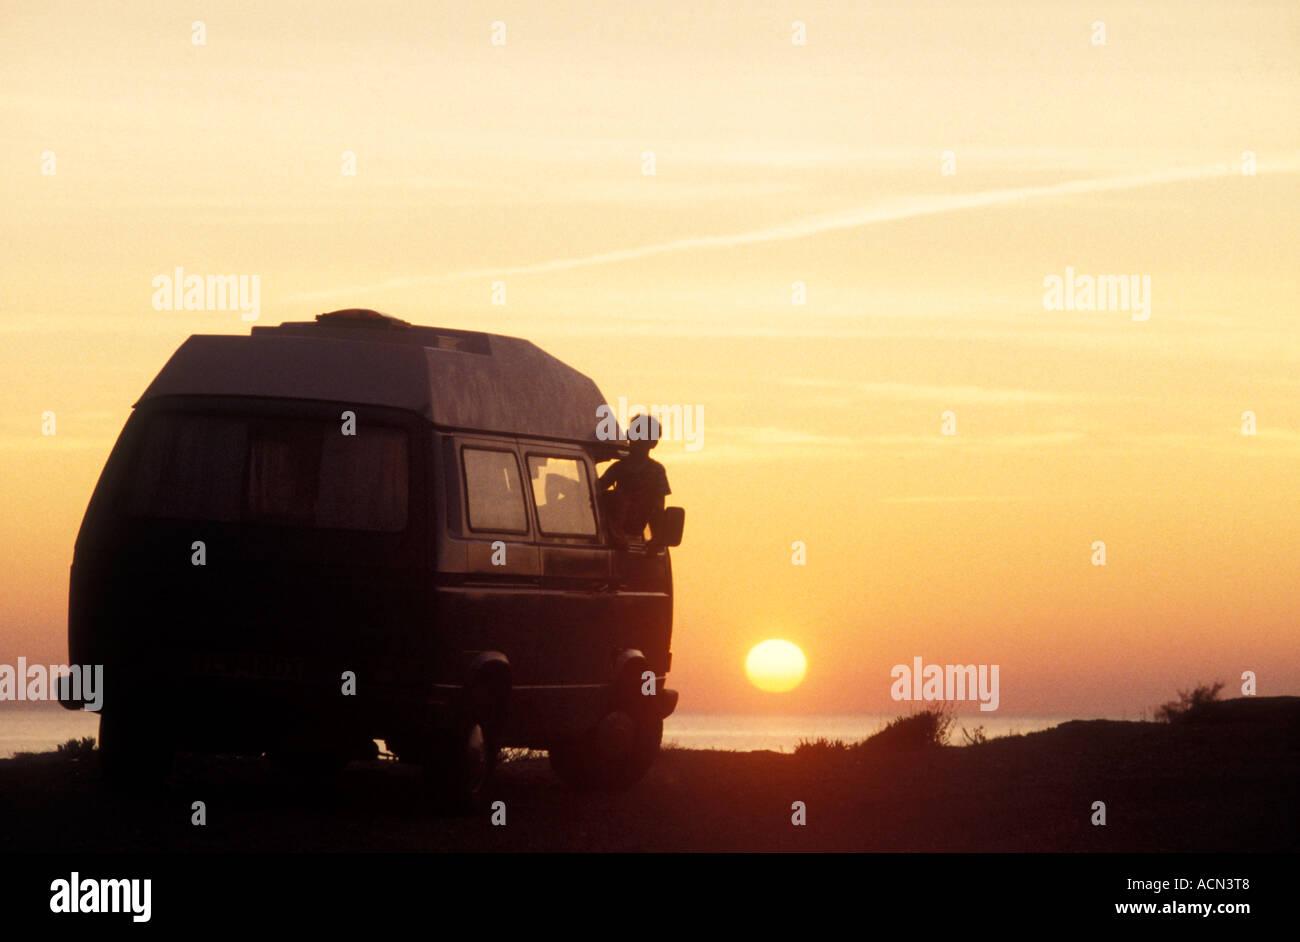 Kombi VW at sunset, photo by Bruce Miller - Stock Image